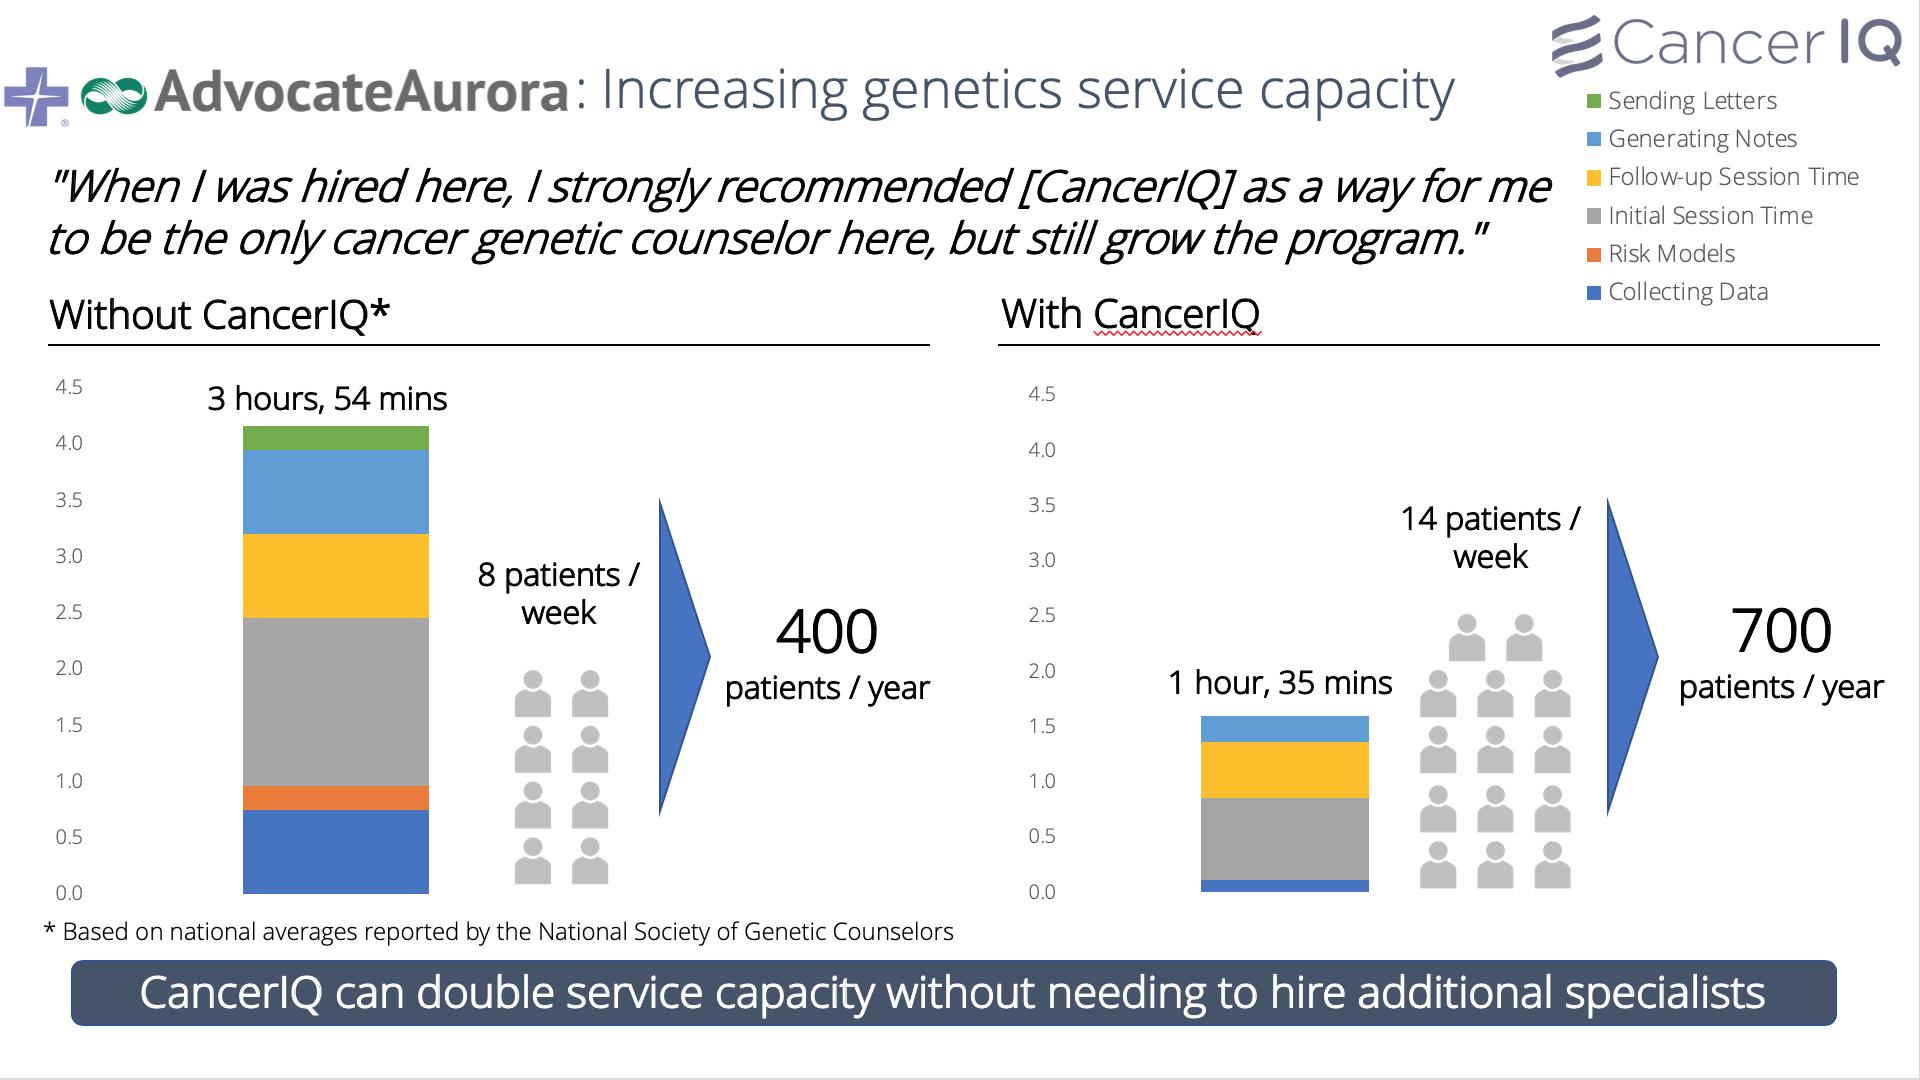 Increase genetics service capacity